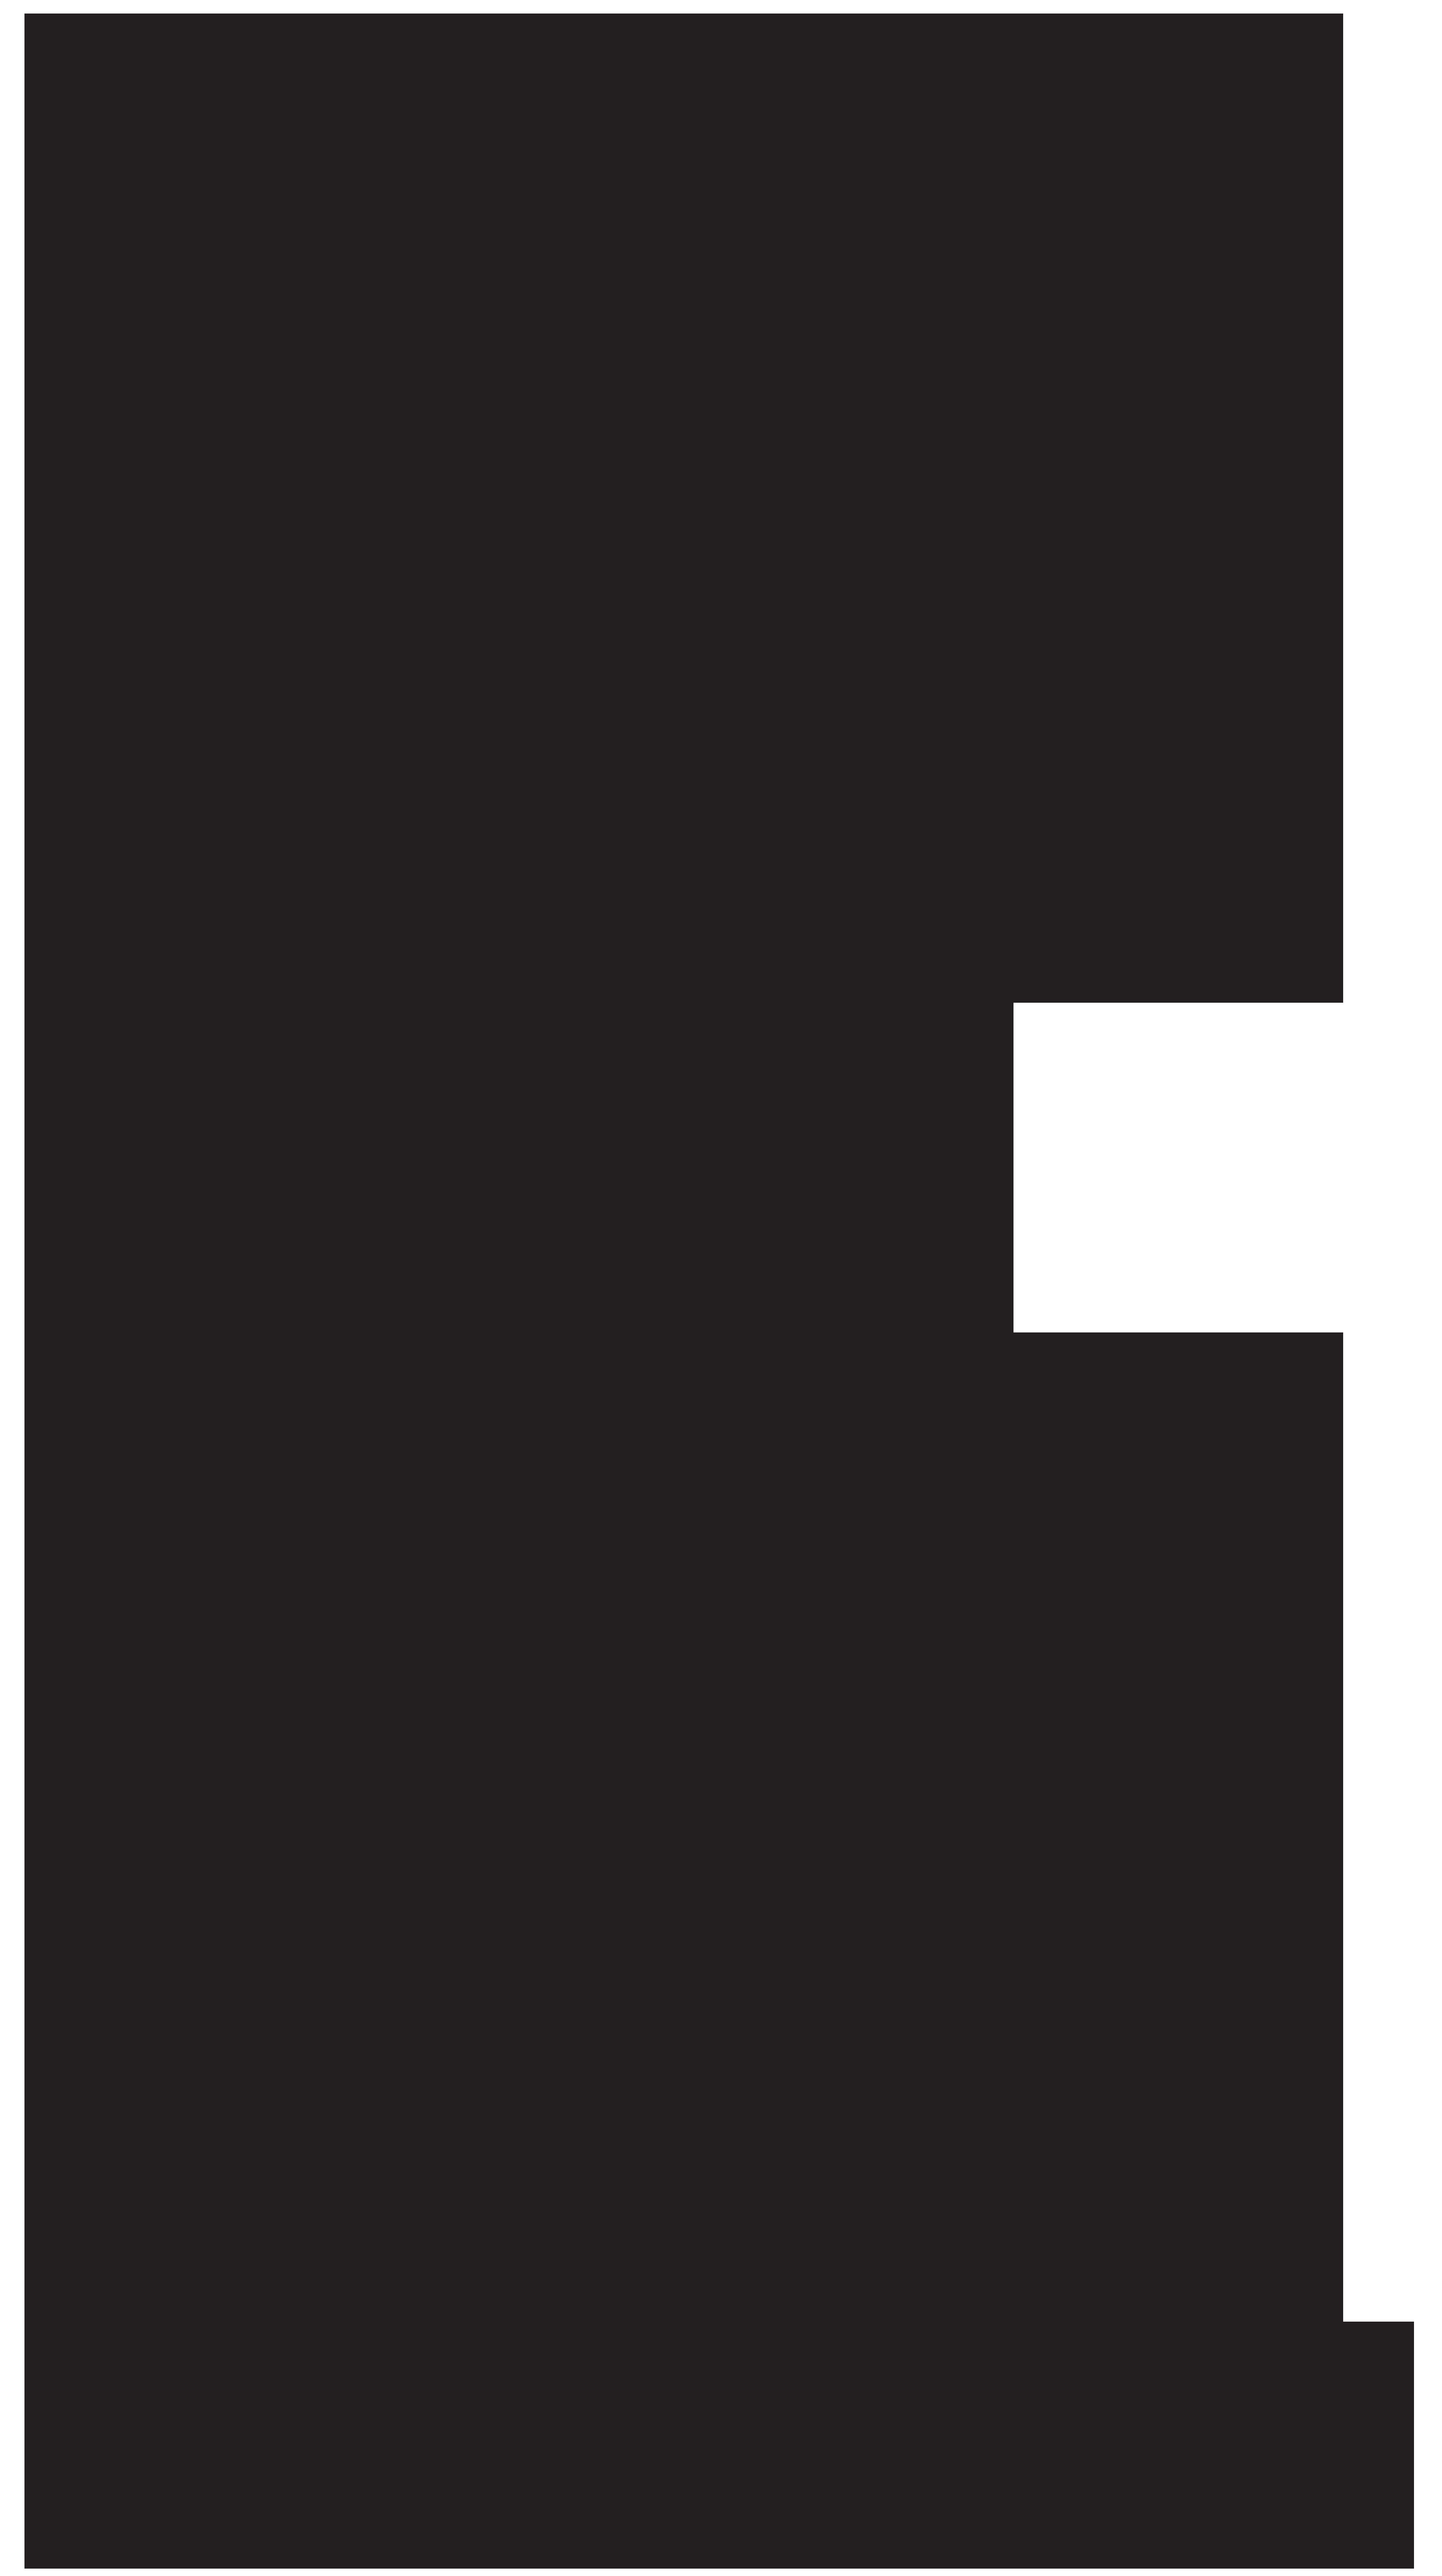 Loving Couple Silhouette Png Clip Art Image Gallery Yopriceville Couple Silhouette Silhouette Clip Art Love Silhouette